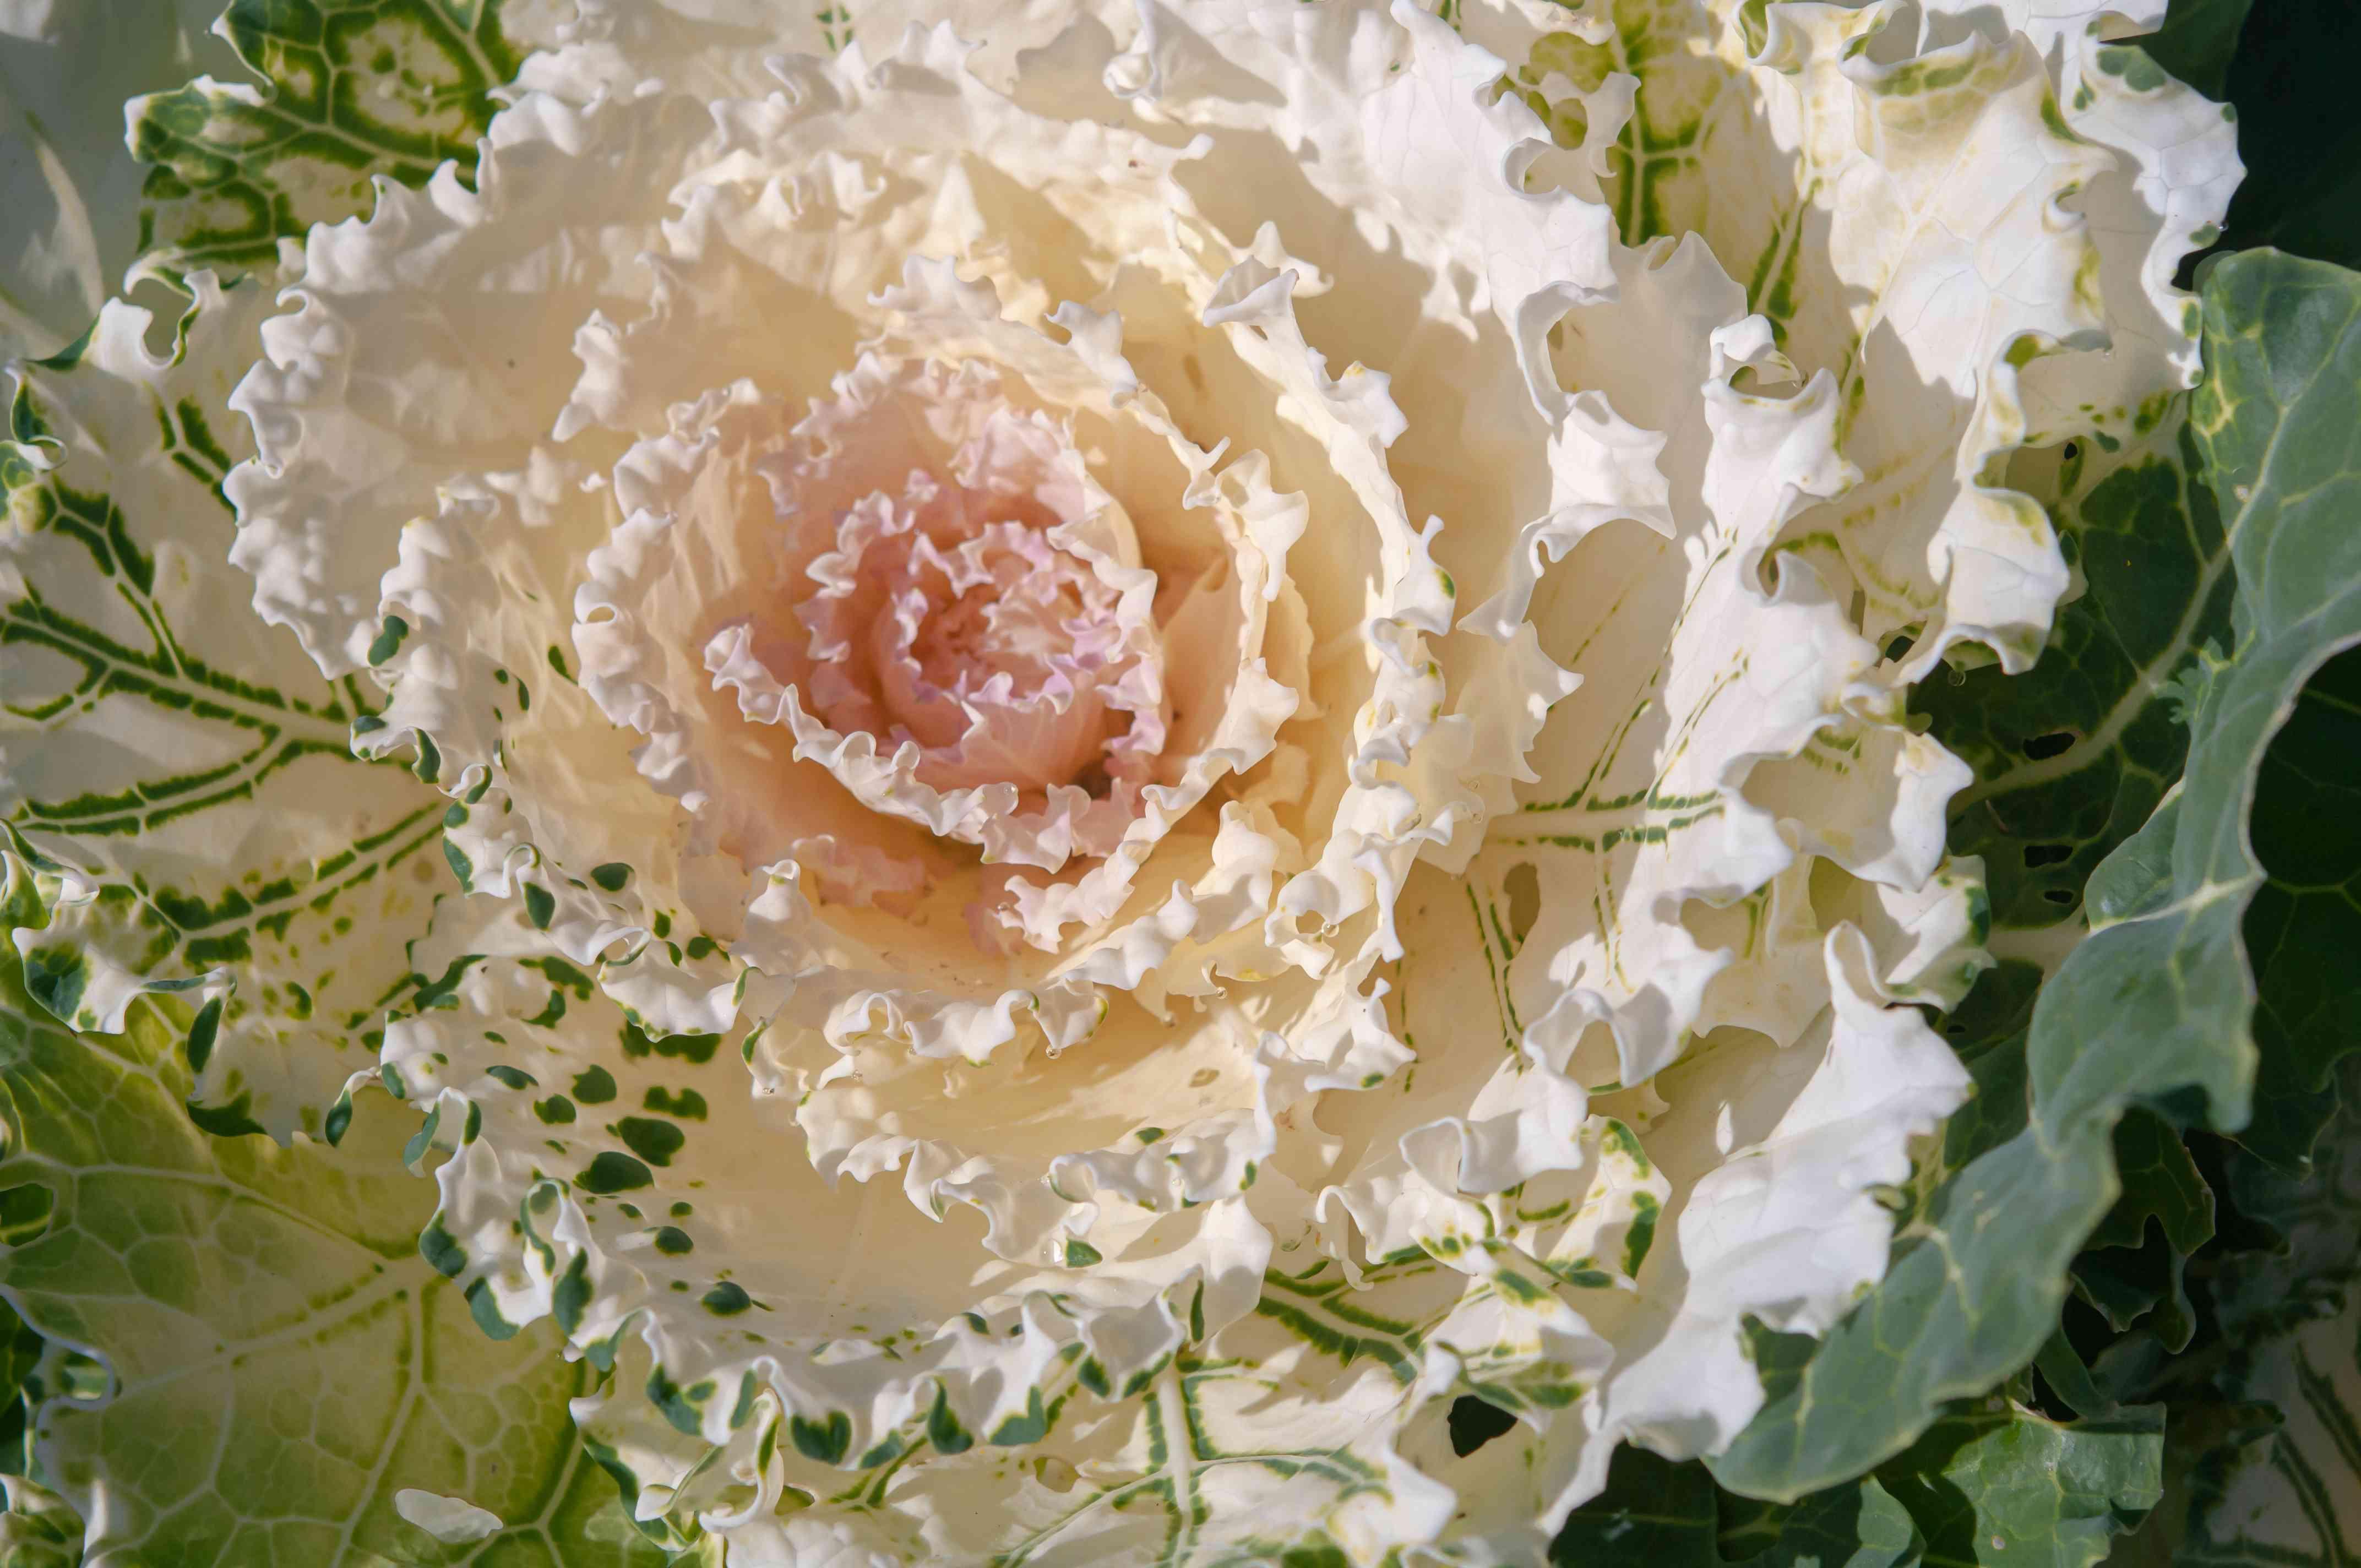 Pigeon white ornamental cabbage with creamy white center closeup